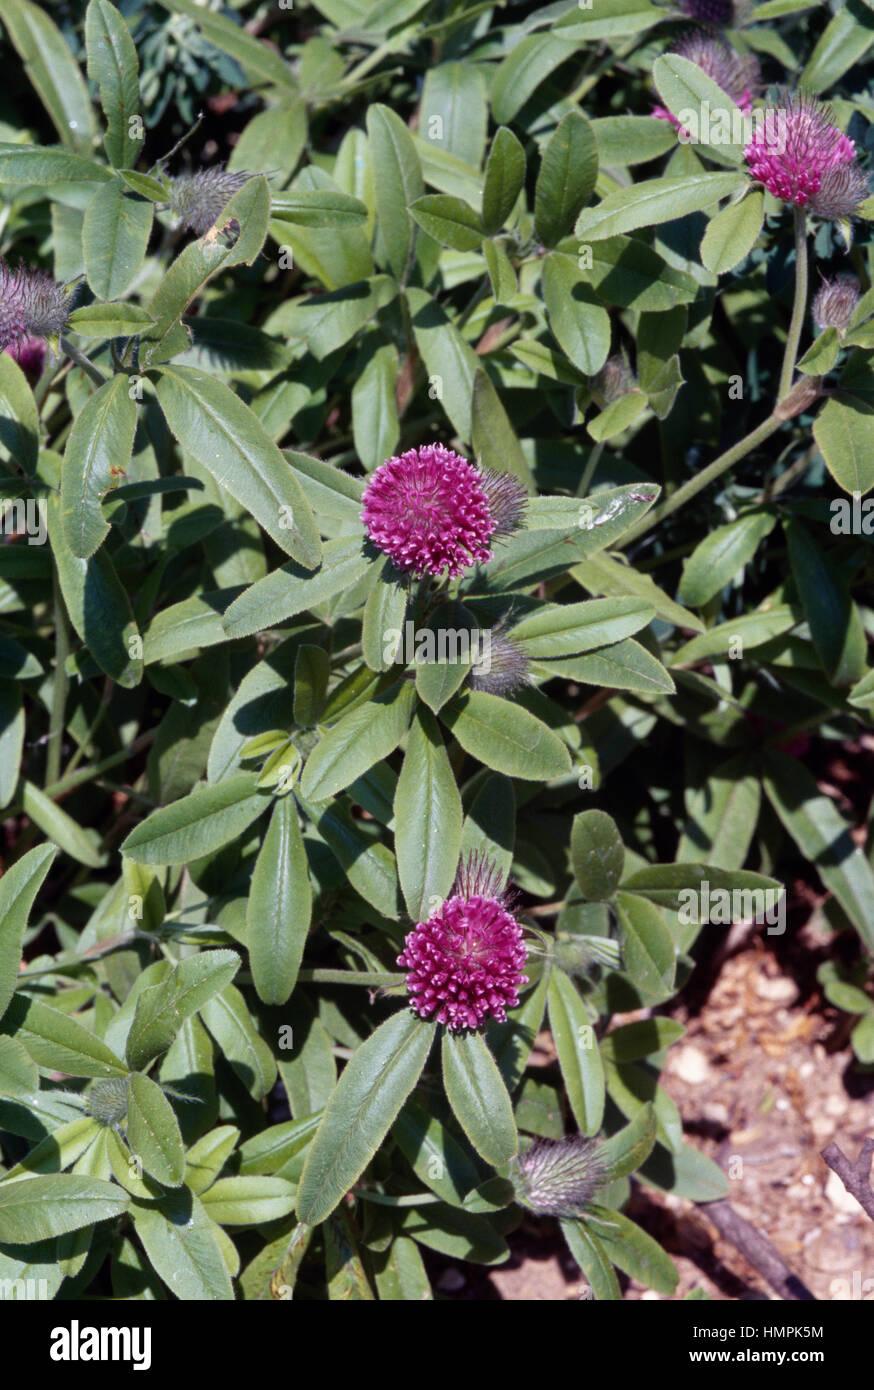 Globo-trébol violeta (Trifolium alpestre, Fabaceae). Imagen De Stock